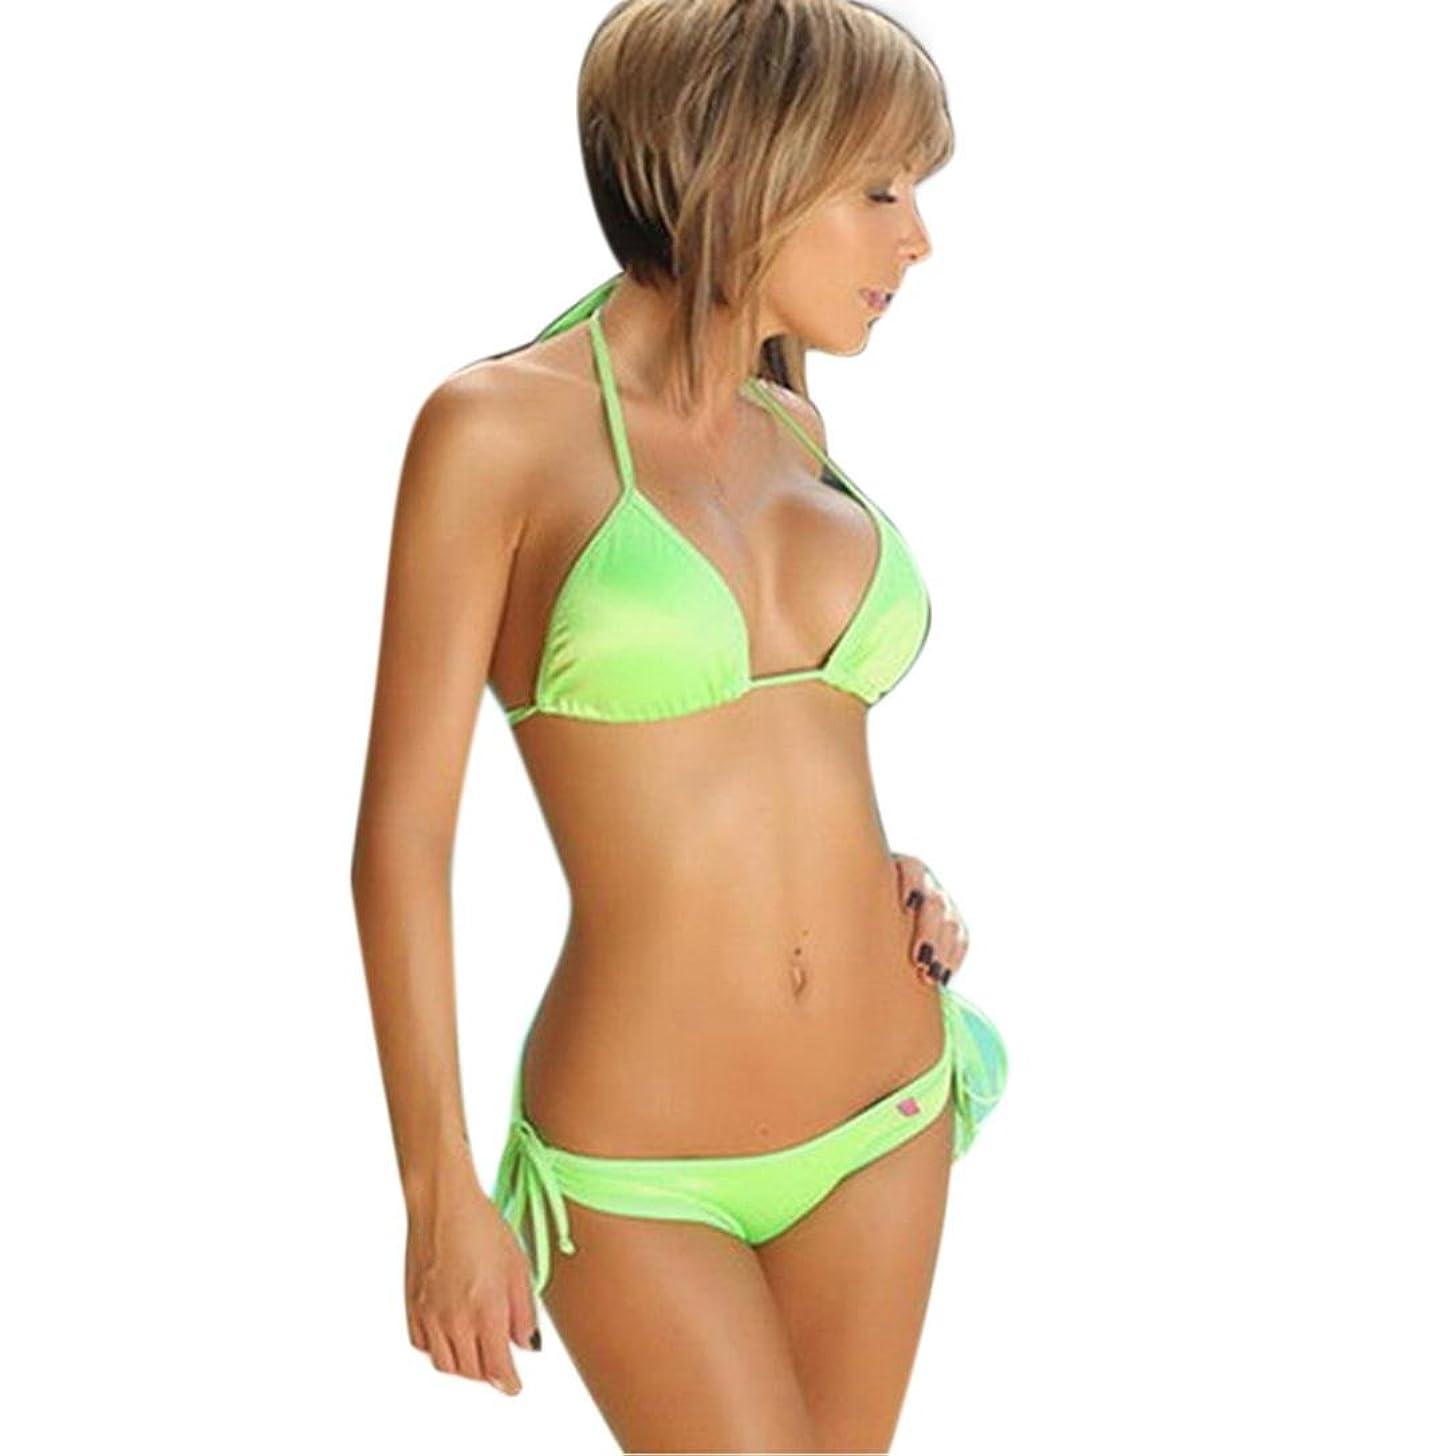 Keepfit String Bikini, Solid Color Triangle Bathing Swimwear for Women Two Pieces